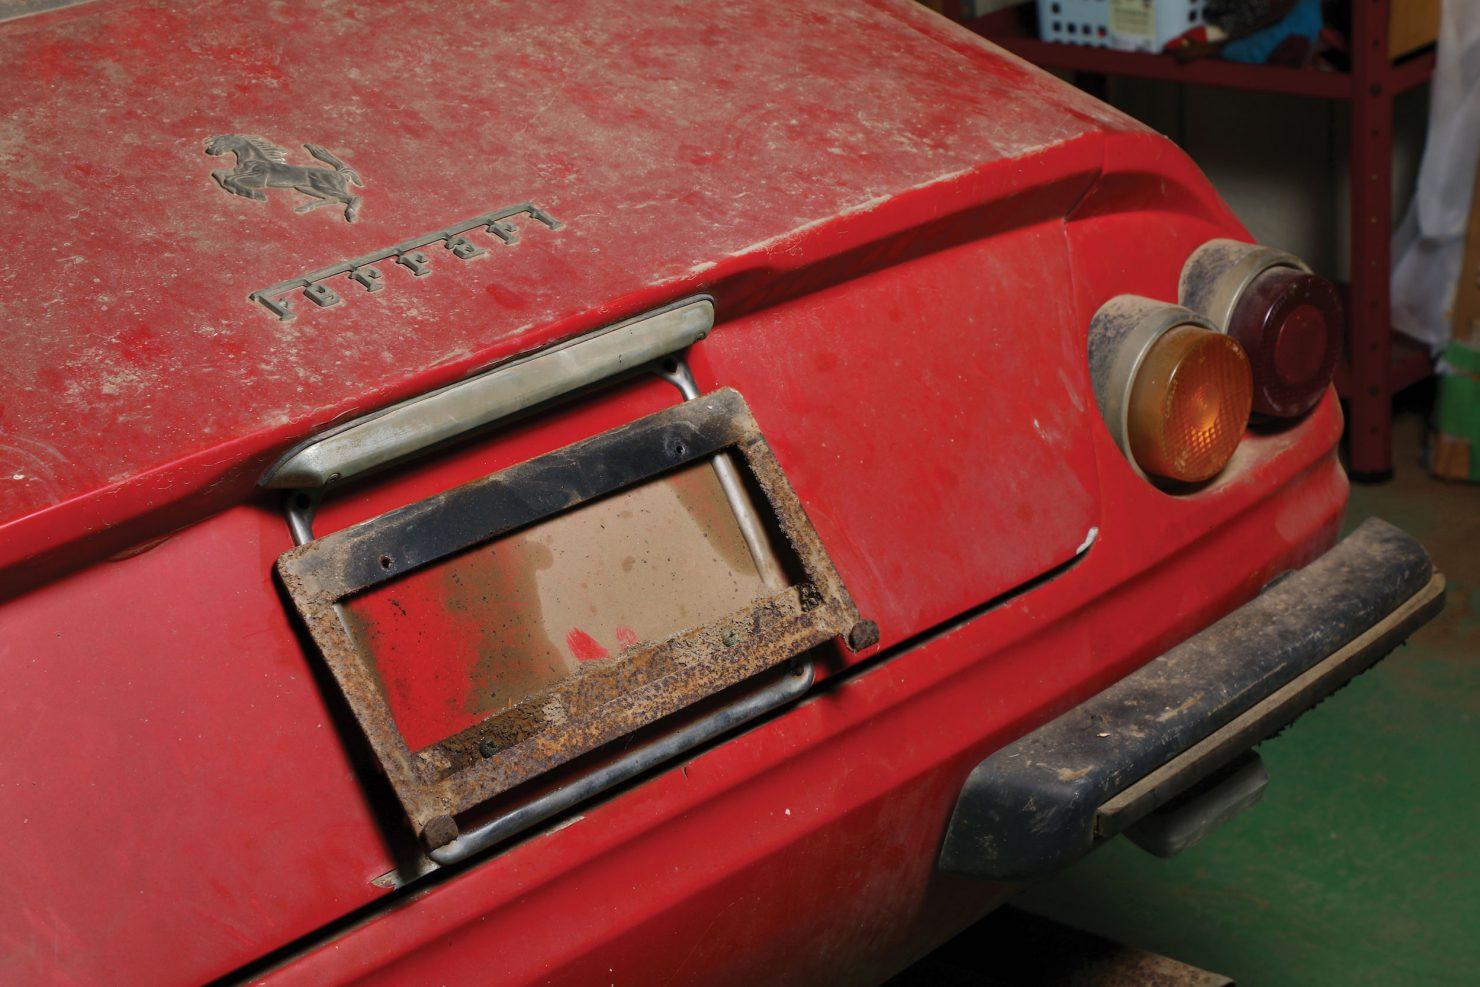 Ferrari 365 GTB4 Daytona Alloy 7 1480x987 - Barn Find: 1969 Ferrari 365 GTB/4 Daytona Alloy